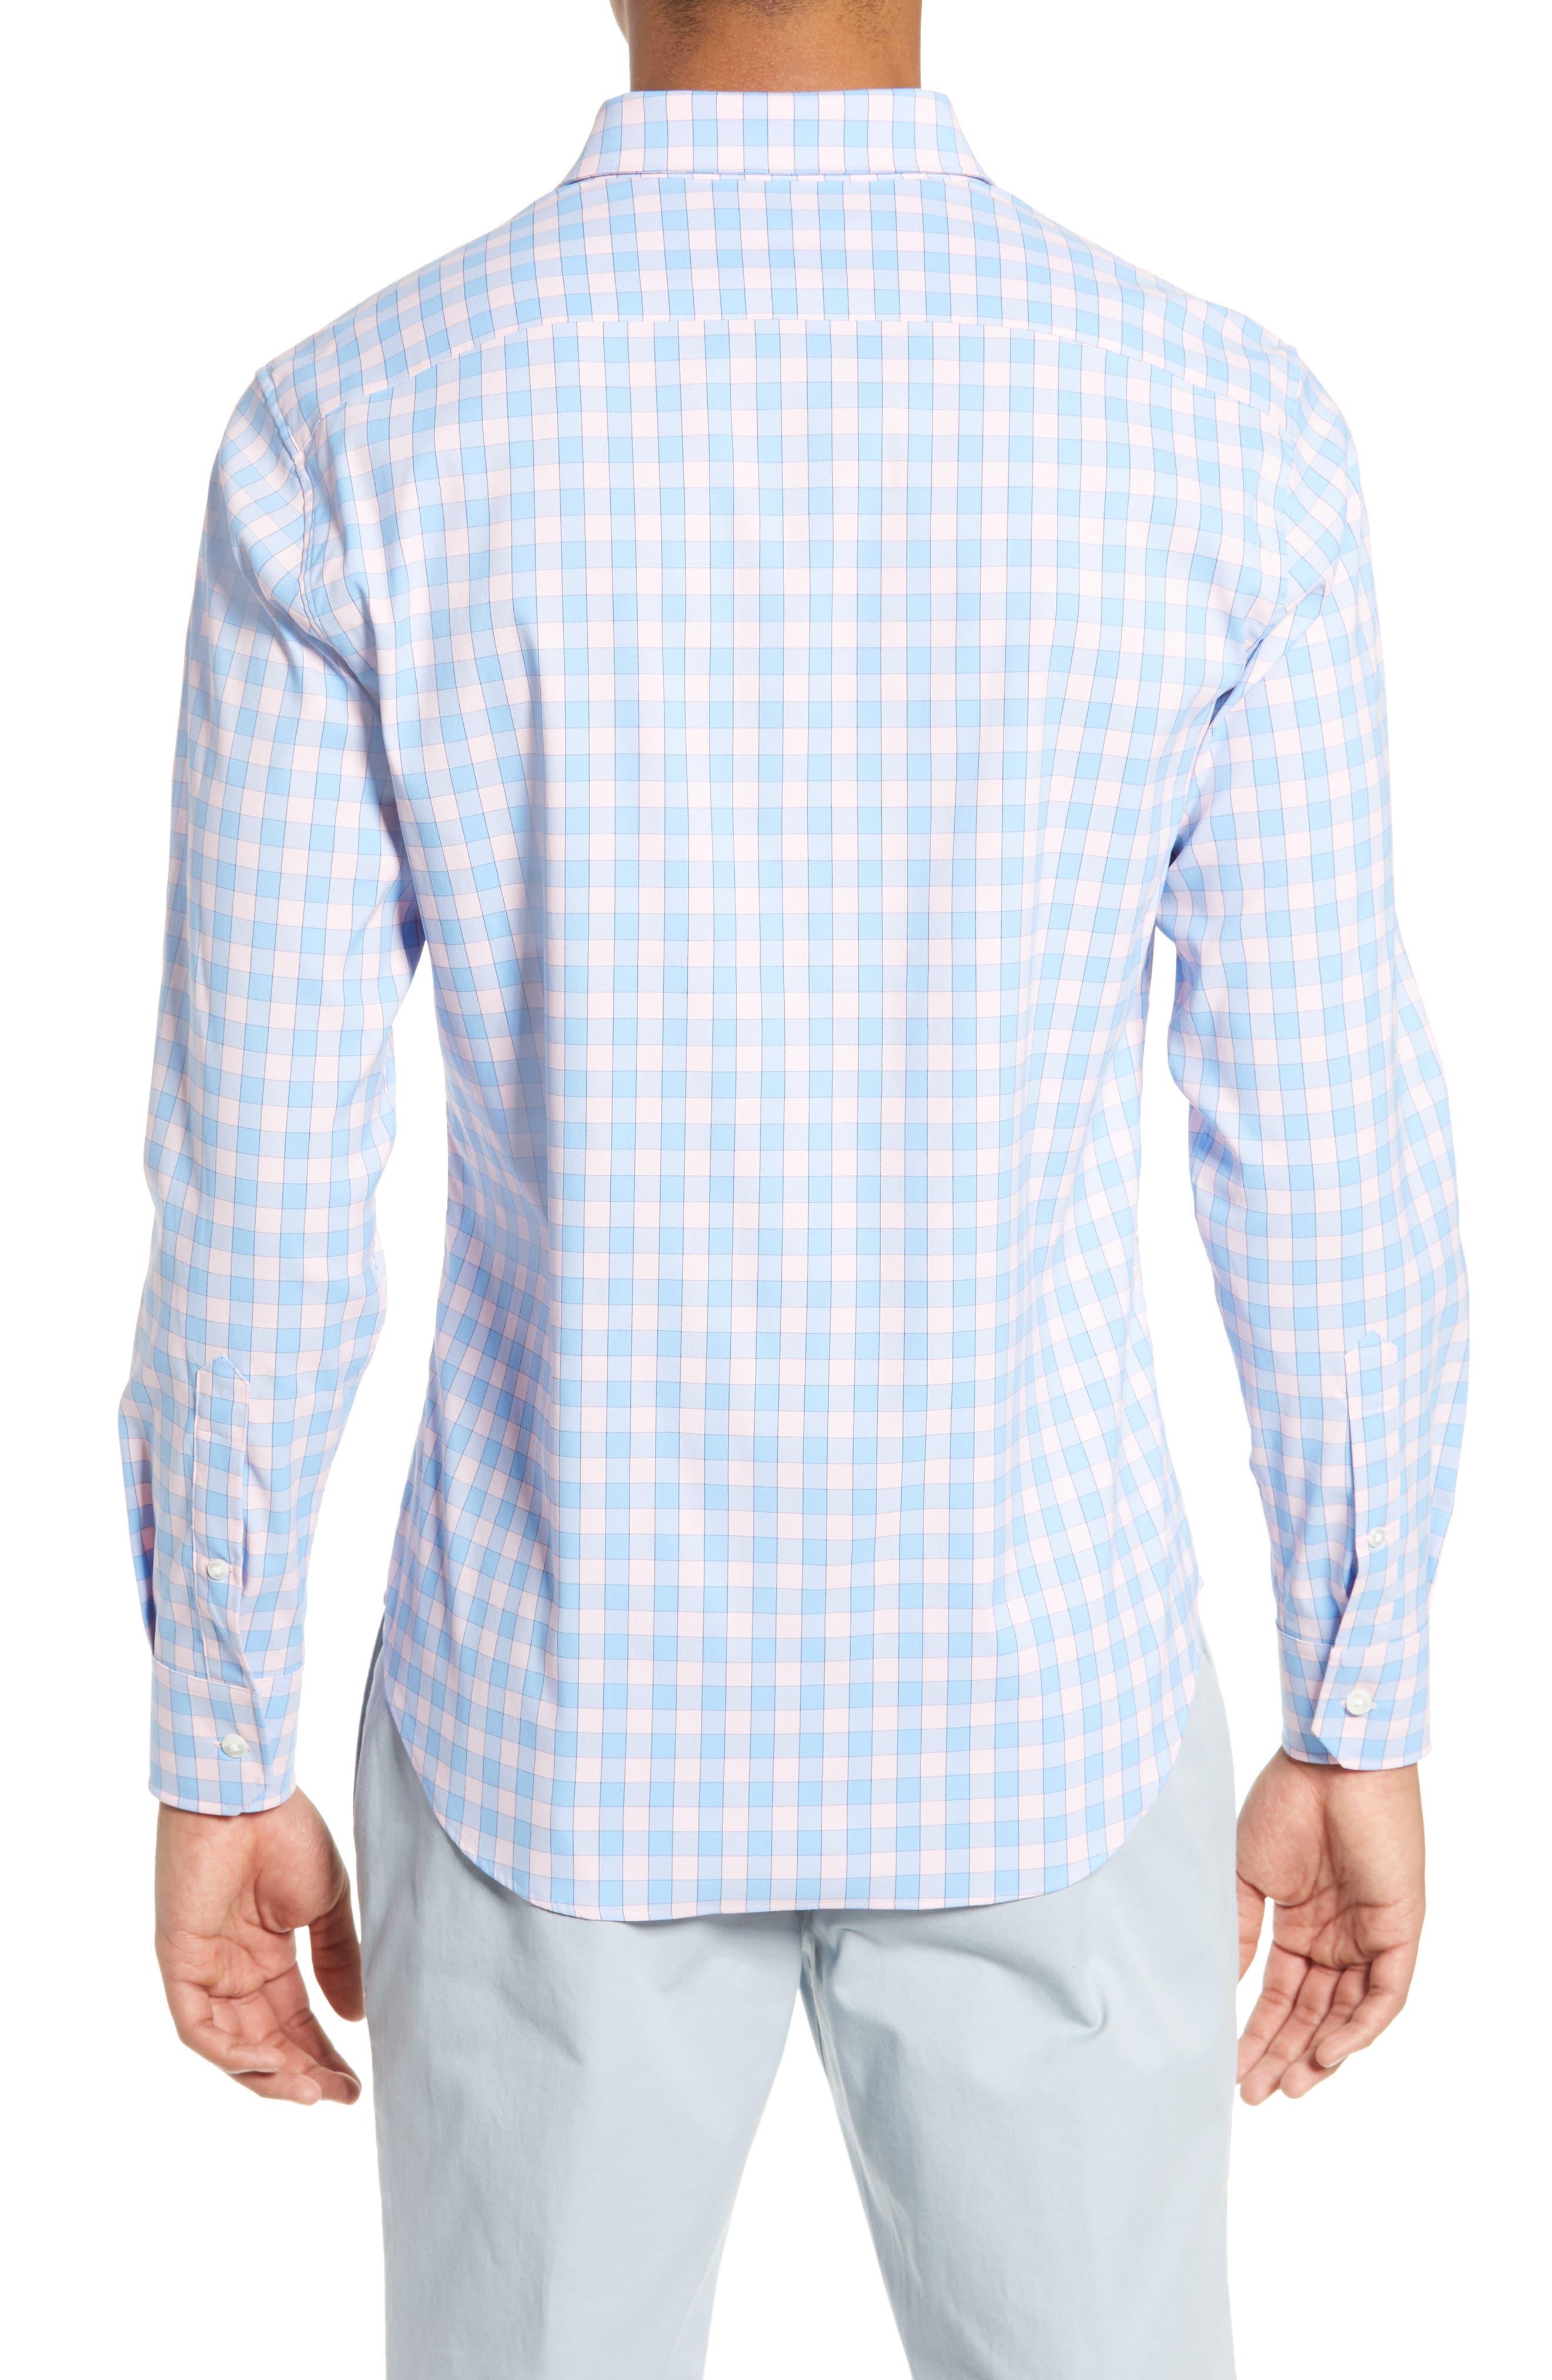 BONOBOS, Slim Fit Check Tech Sport Shirt, Alternate thumbnail 3, color, SAIL BOAT FIRST BLUSH